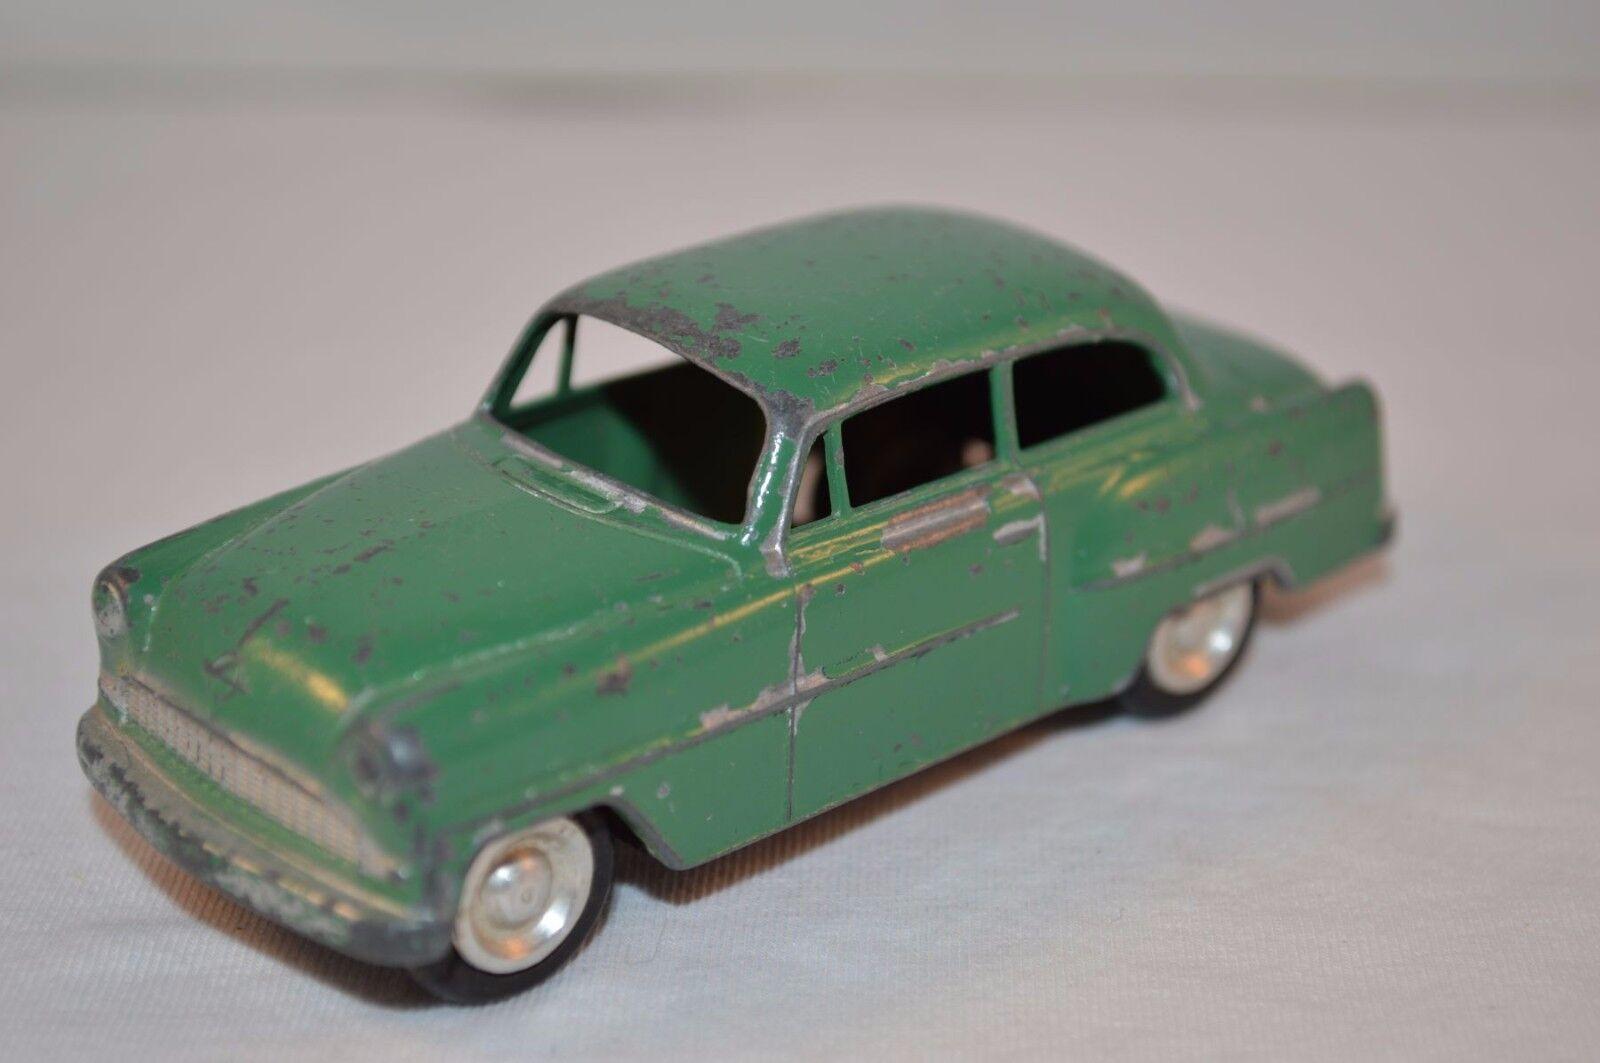 punto de venta Lion Coche Coche Coche Opel Record verde made in Holland 1e type very nice condition  Más asequible